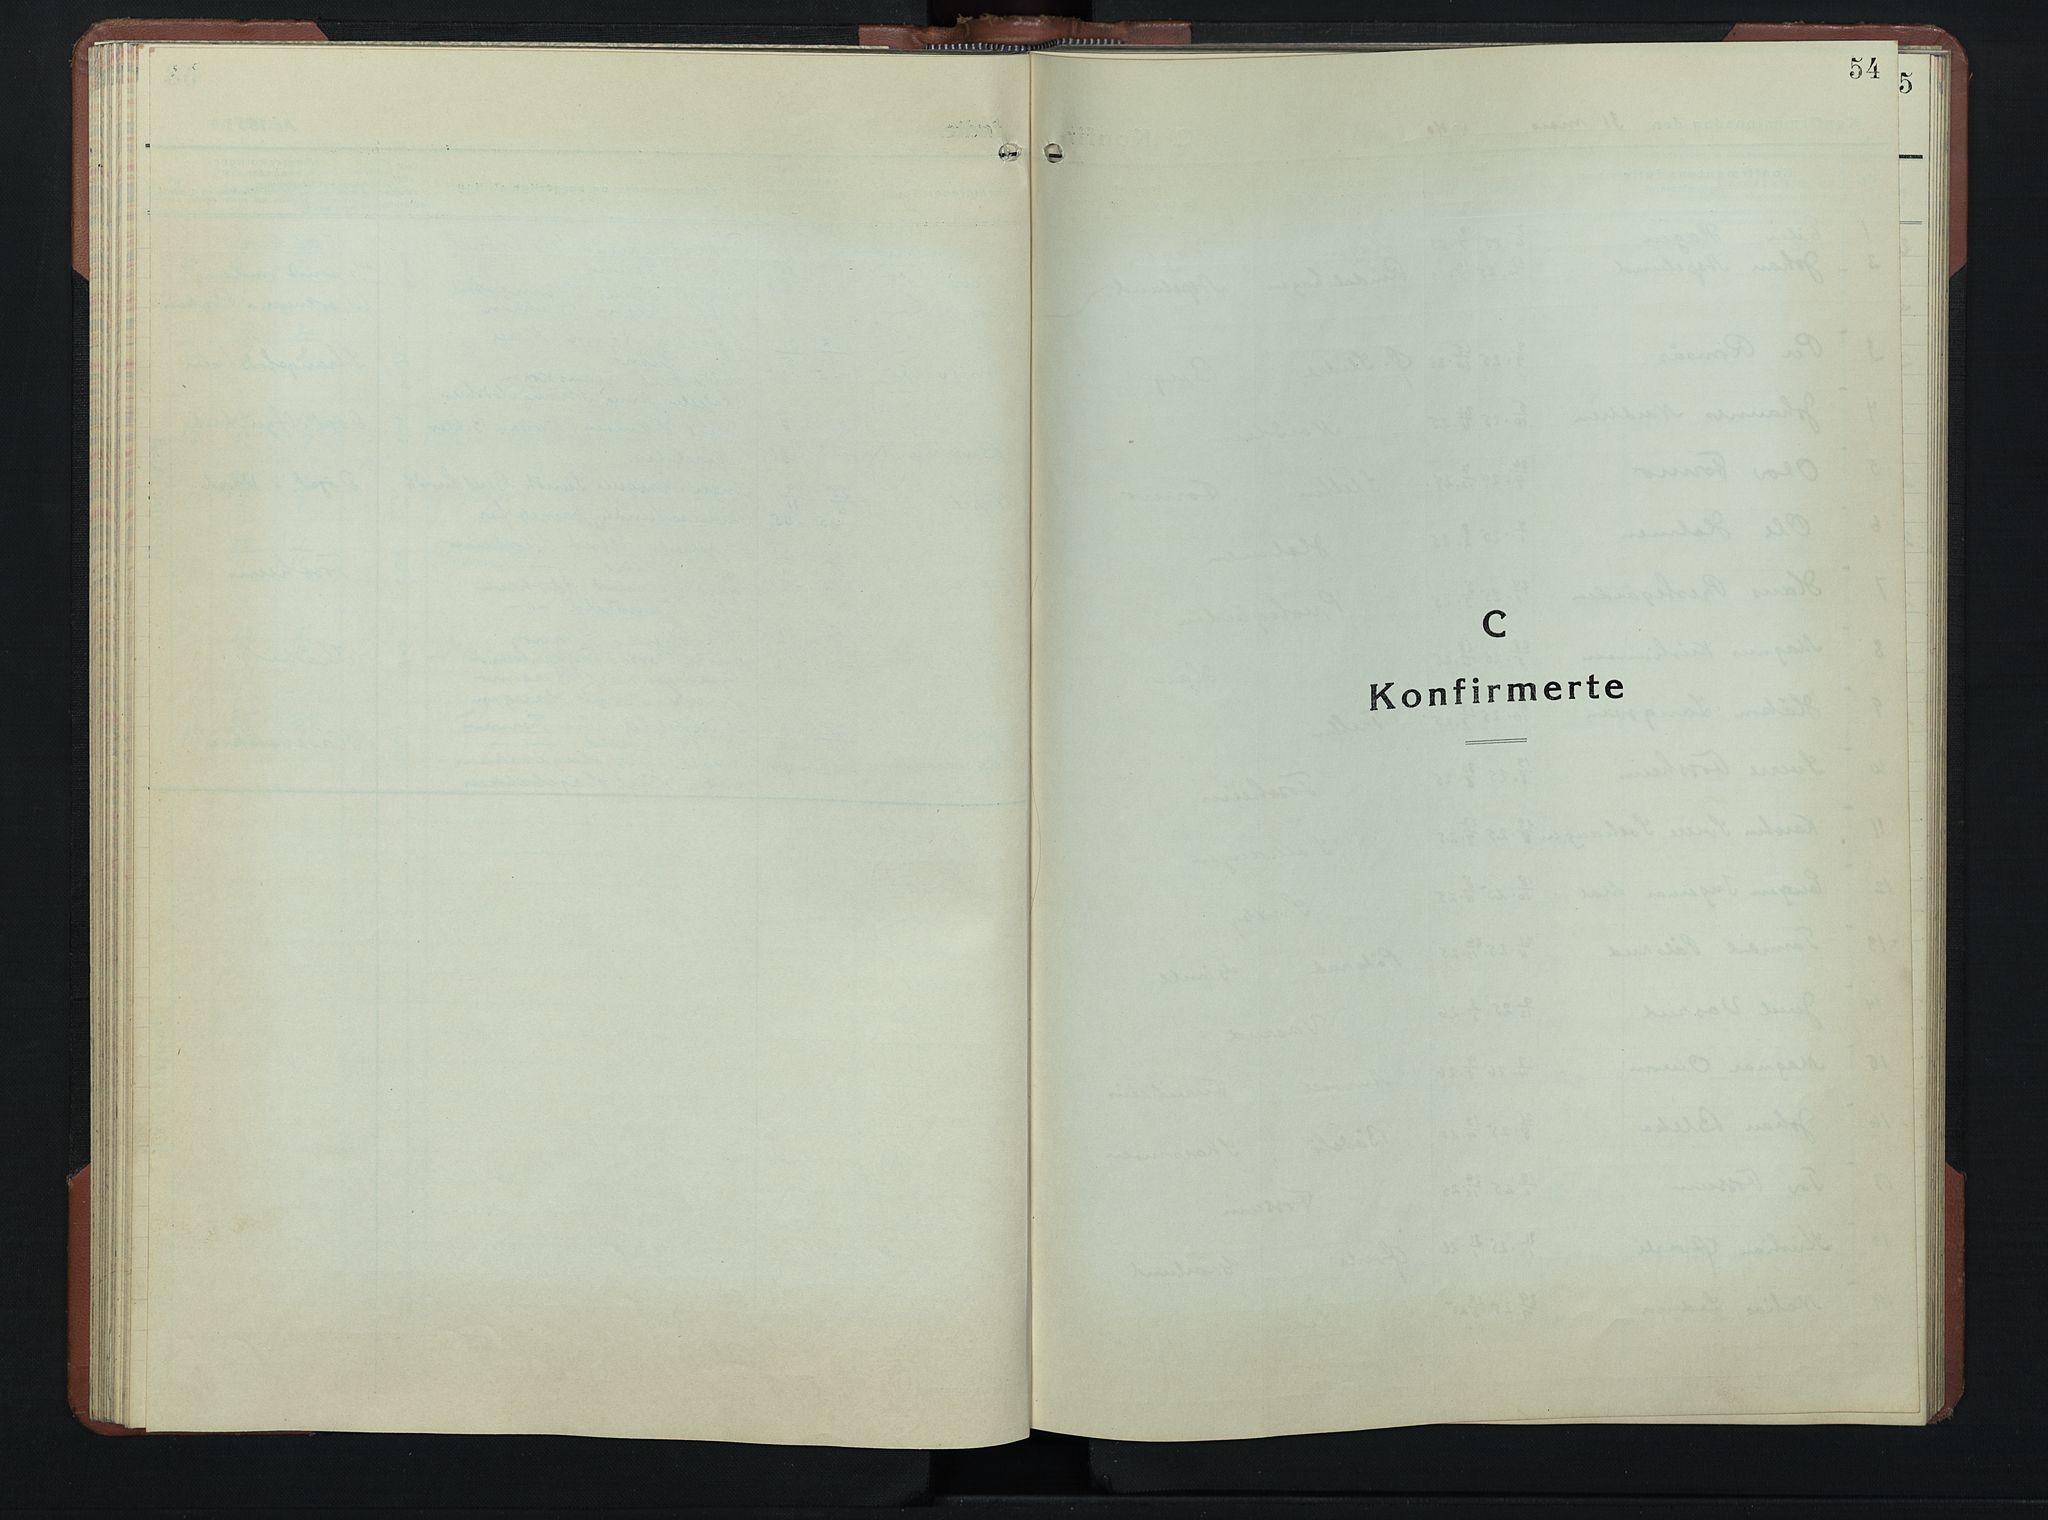 SAH, Øyer prestekontor, Klokkerbok nr. 9, 1939-1953, s. 54